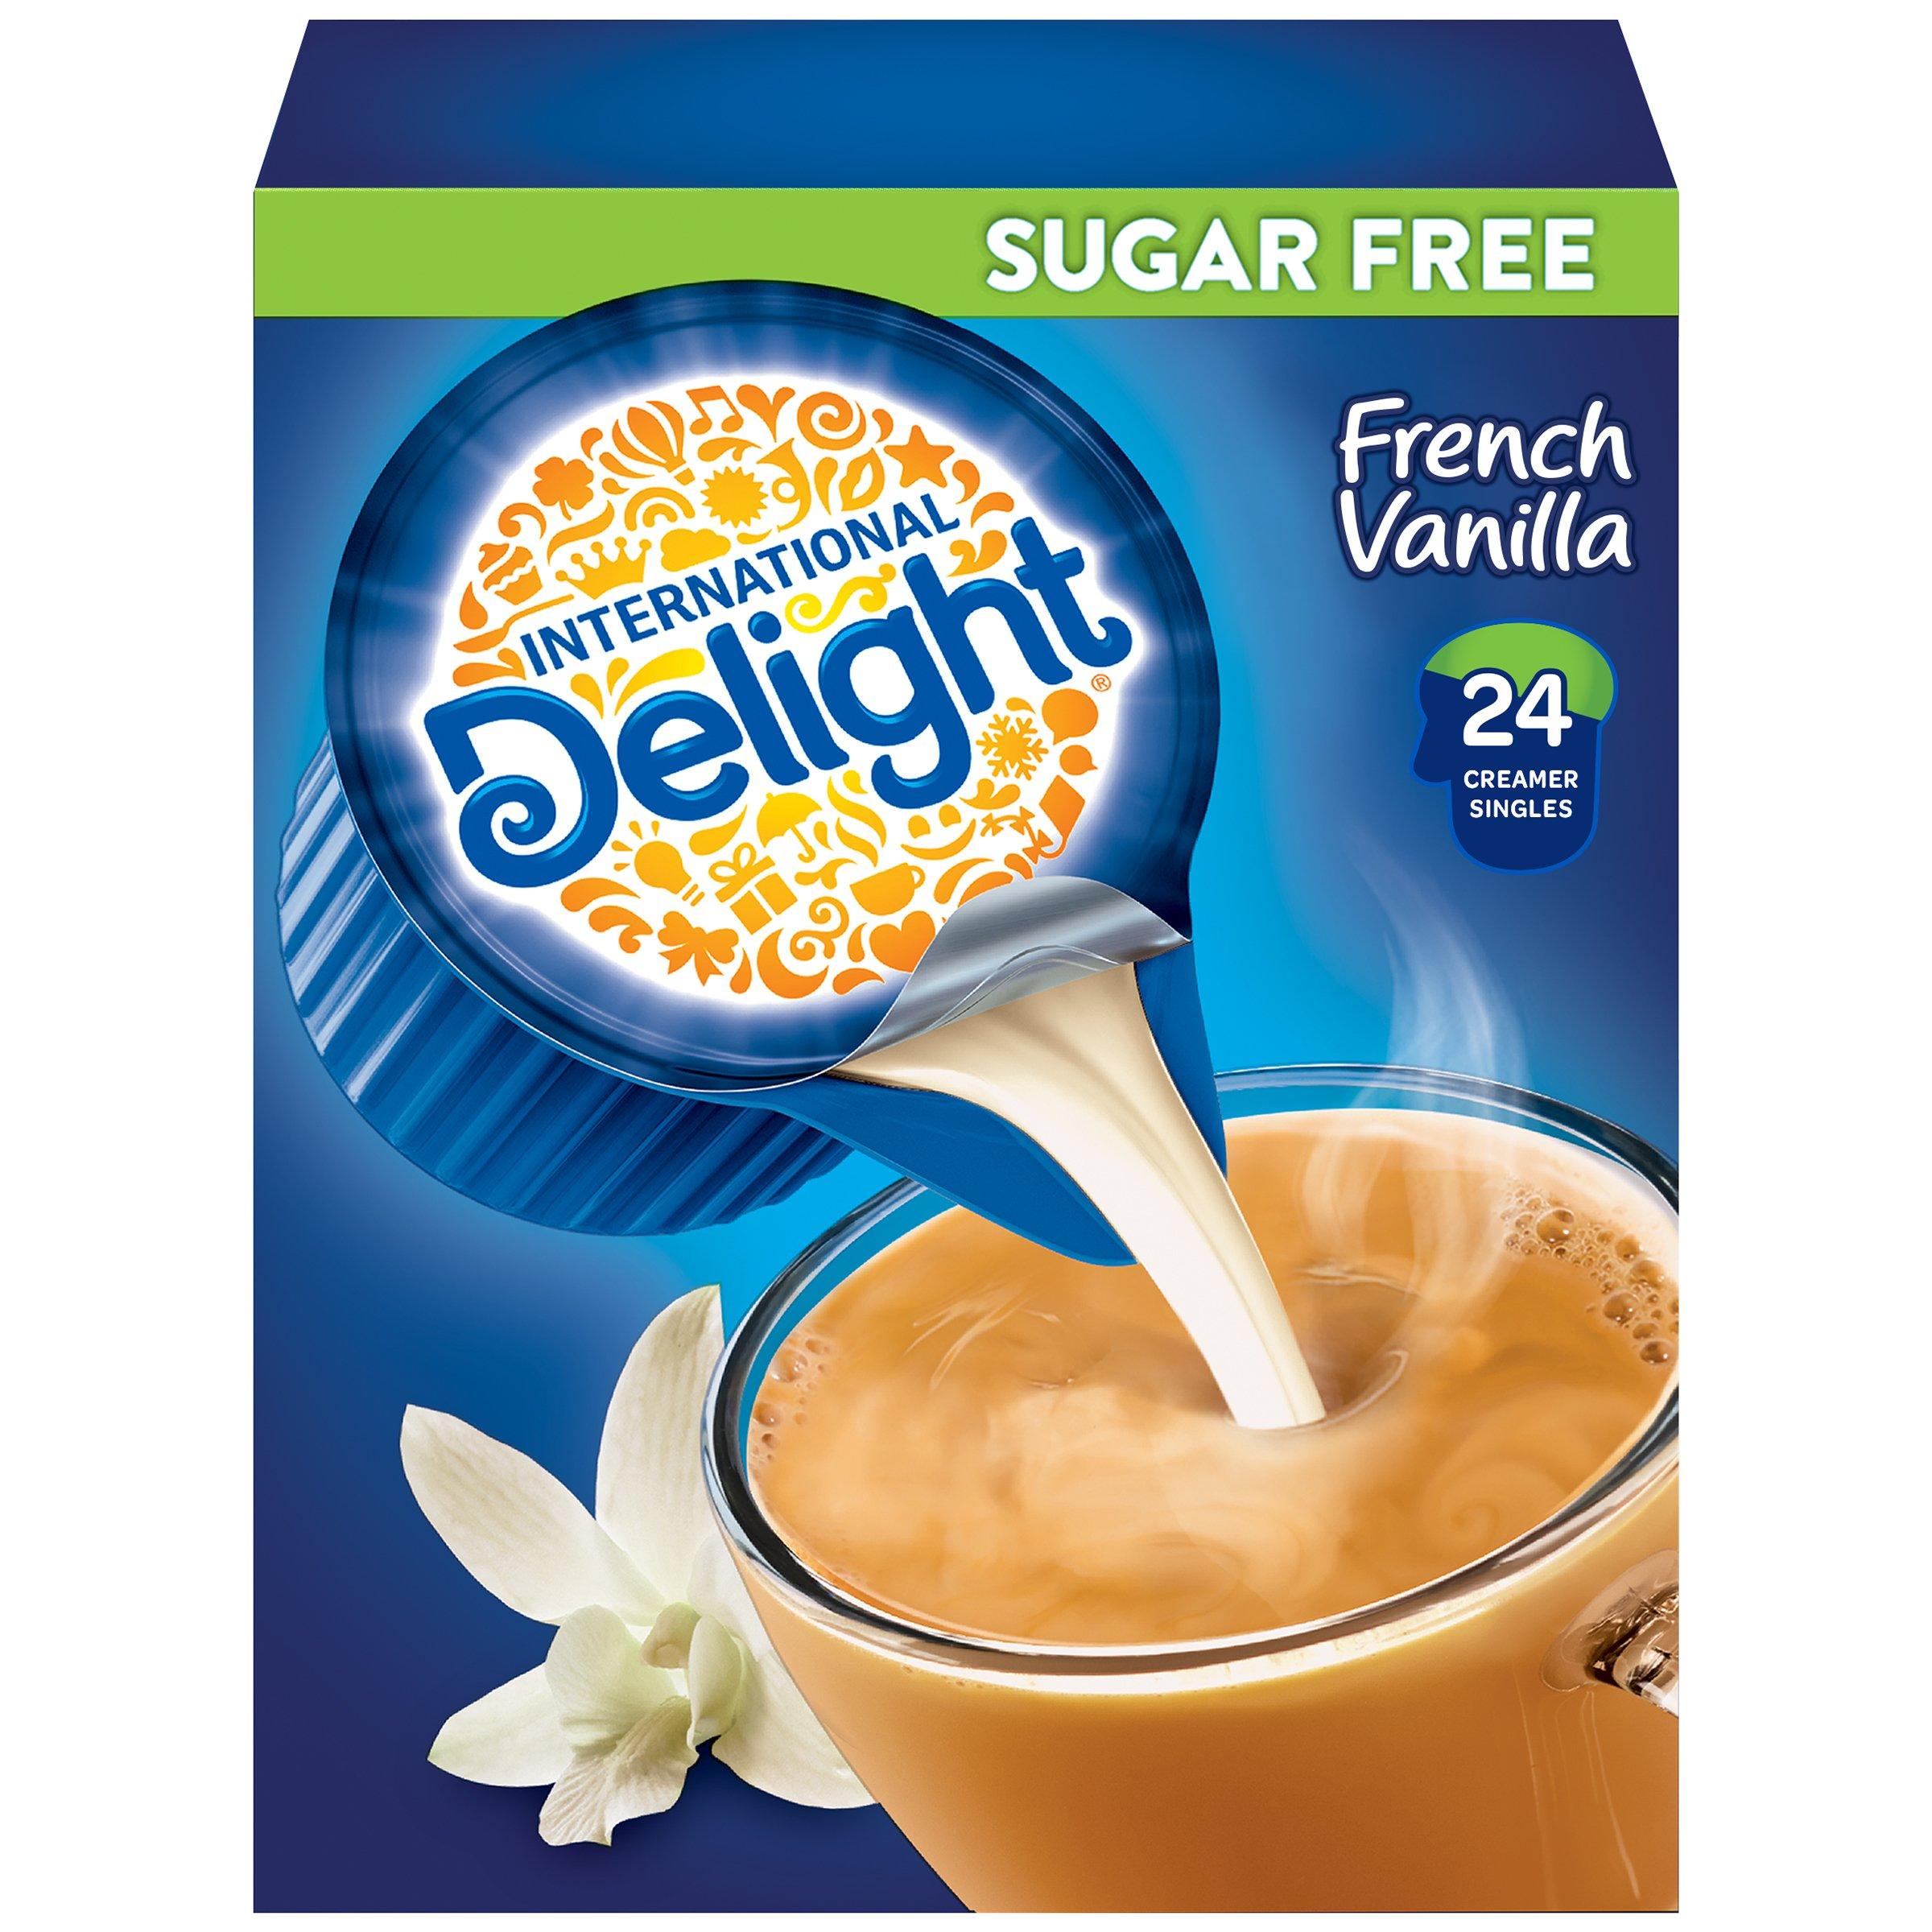 Sugar Free French Vanilla Liquid Coffee